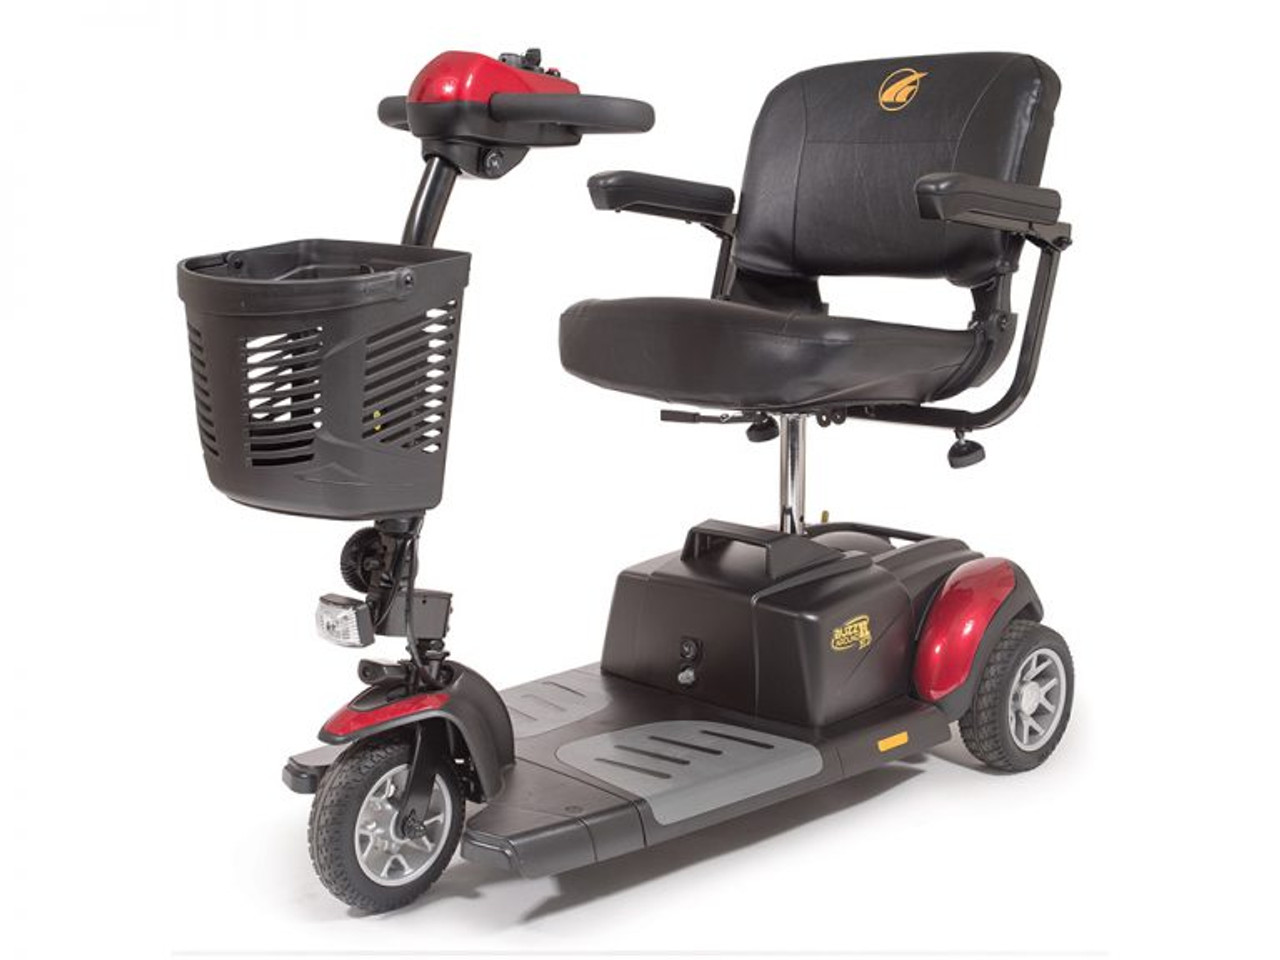 Buzzaround XL 3 Wheel Travel Mobility Scooter